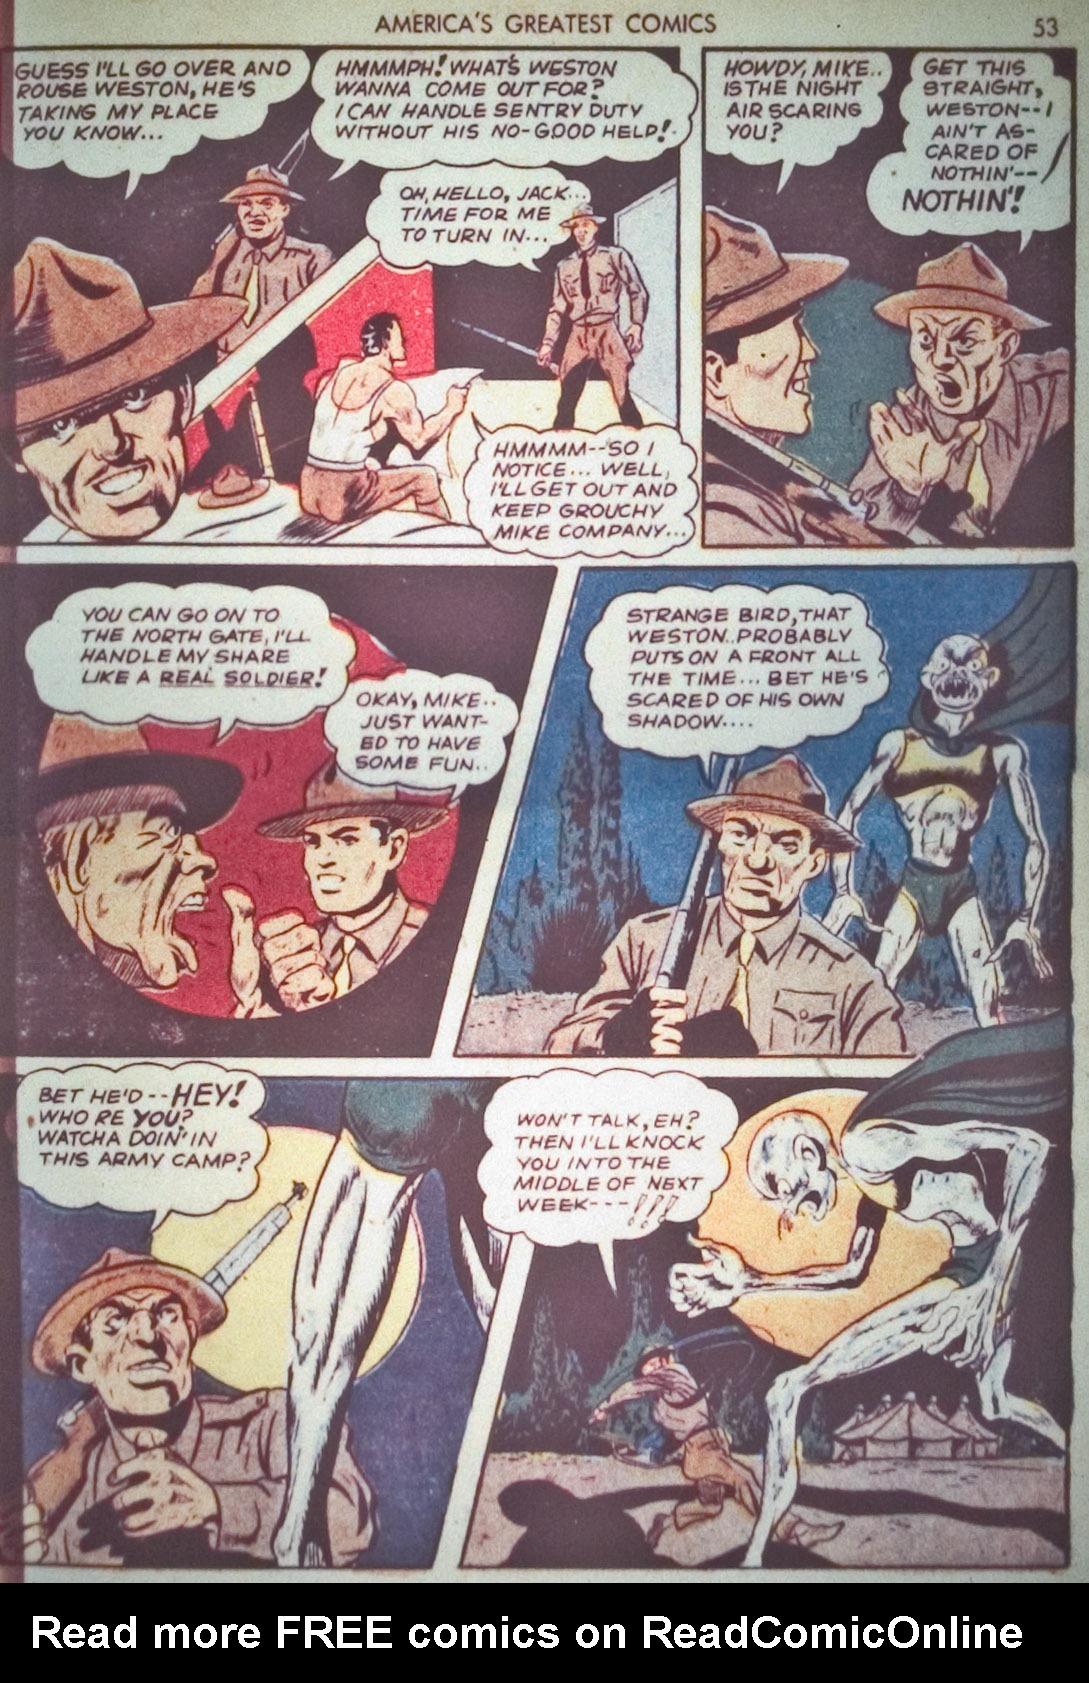 Read online America's Greatest Comics comic -  Issue #1 - 56